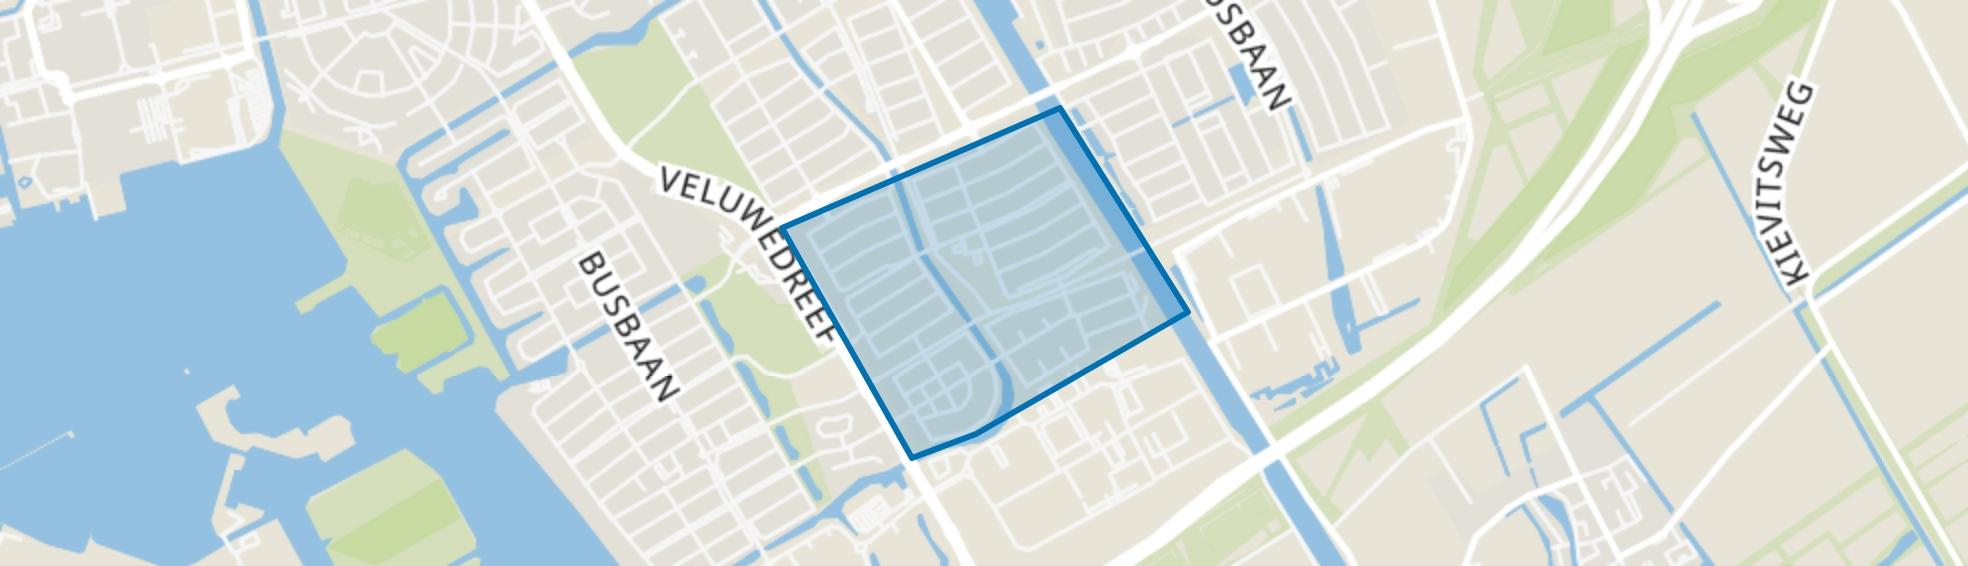 Danswijk, Almere map